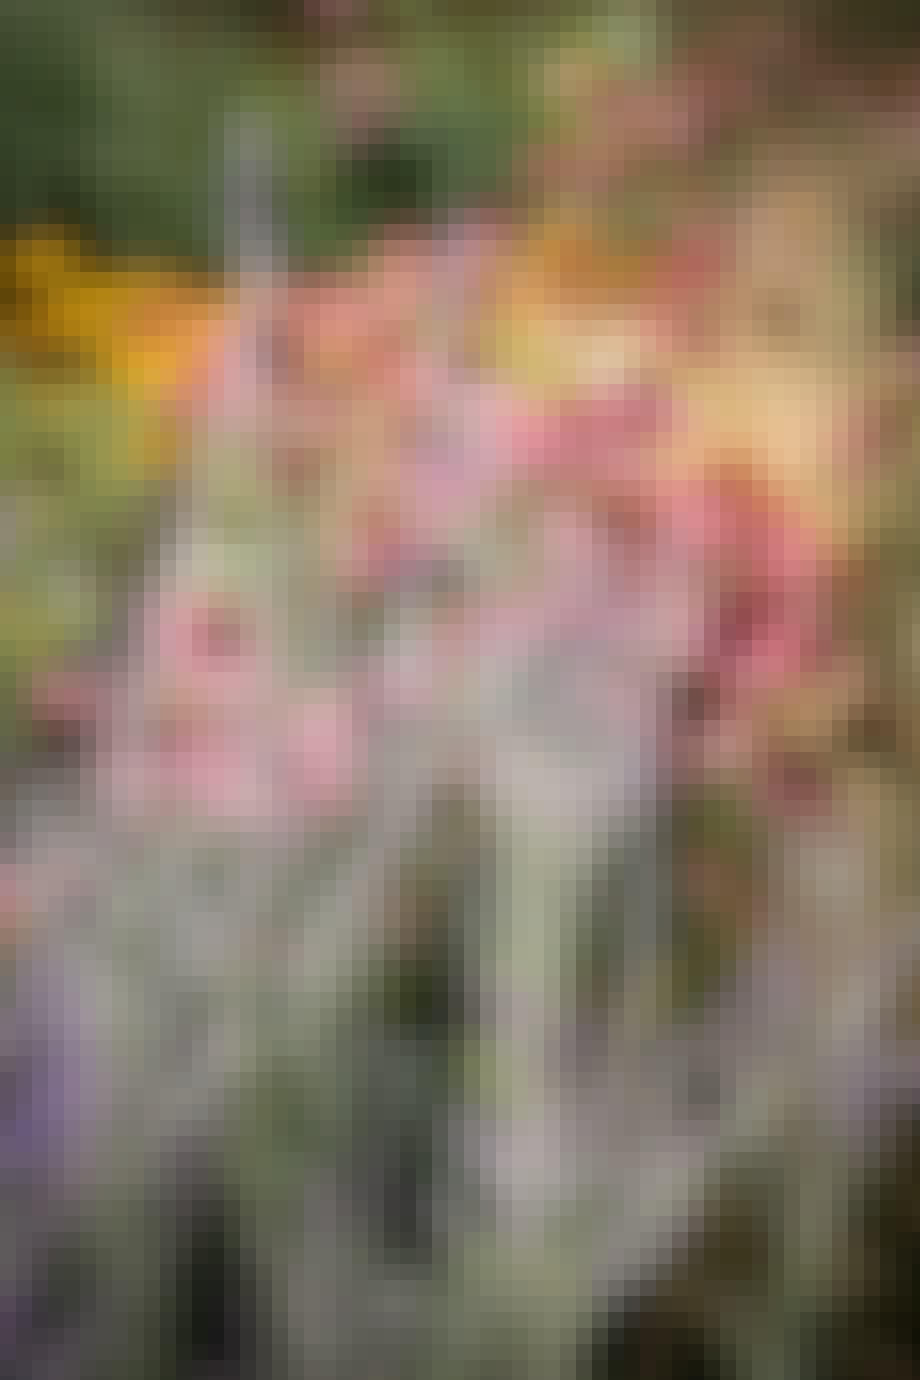 blomsterbed russisk salvie og Echinacea